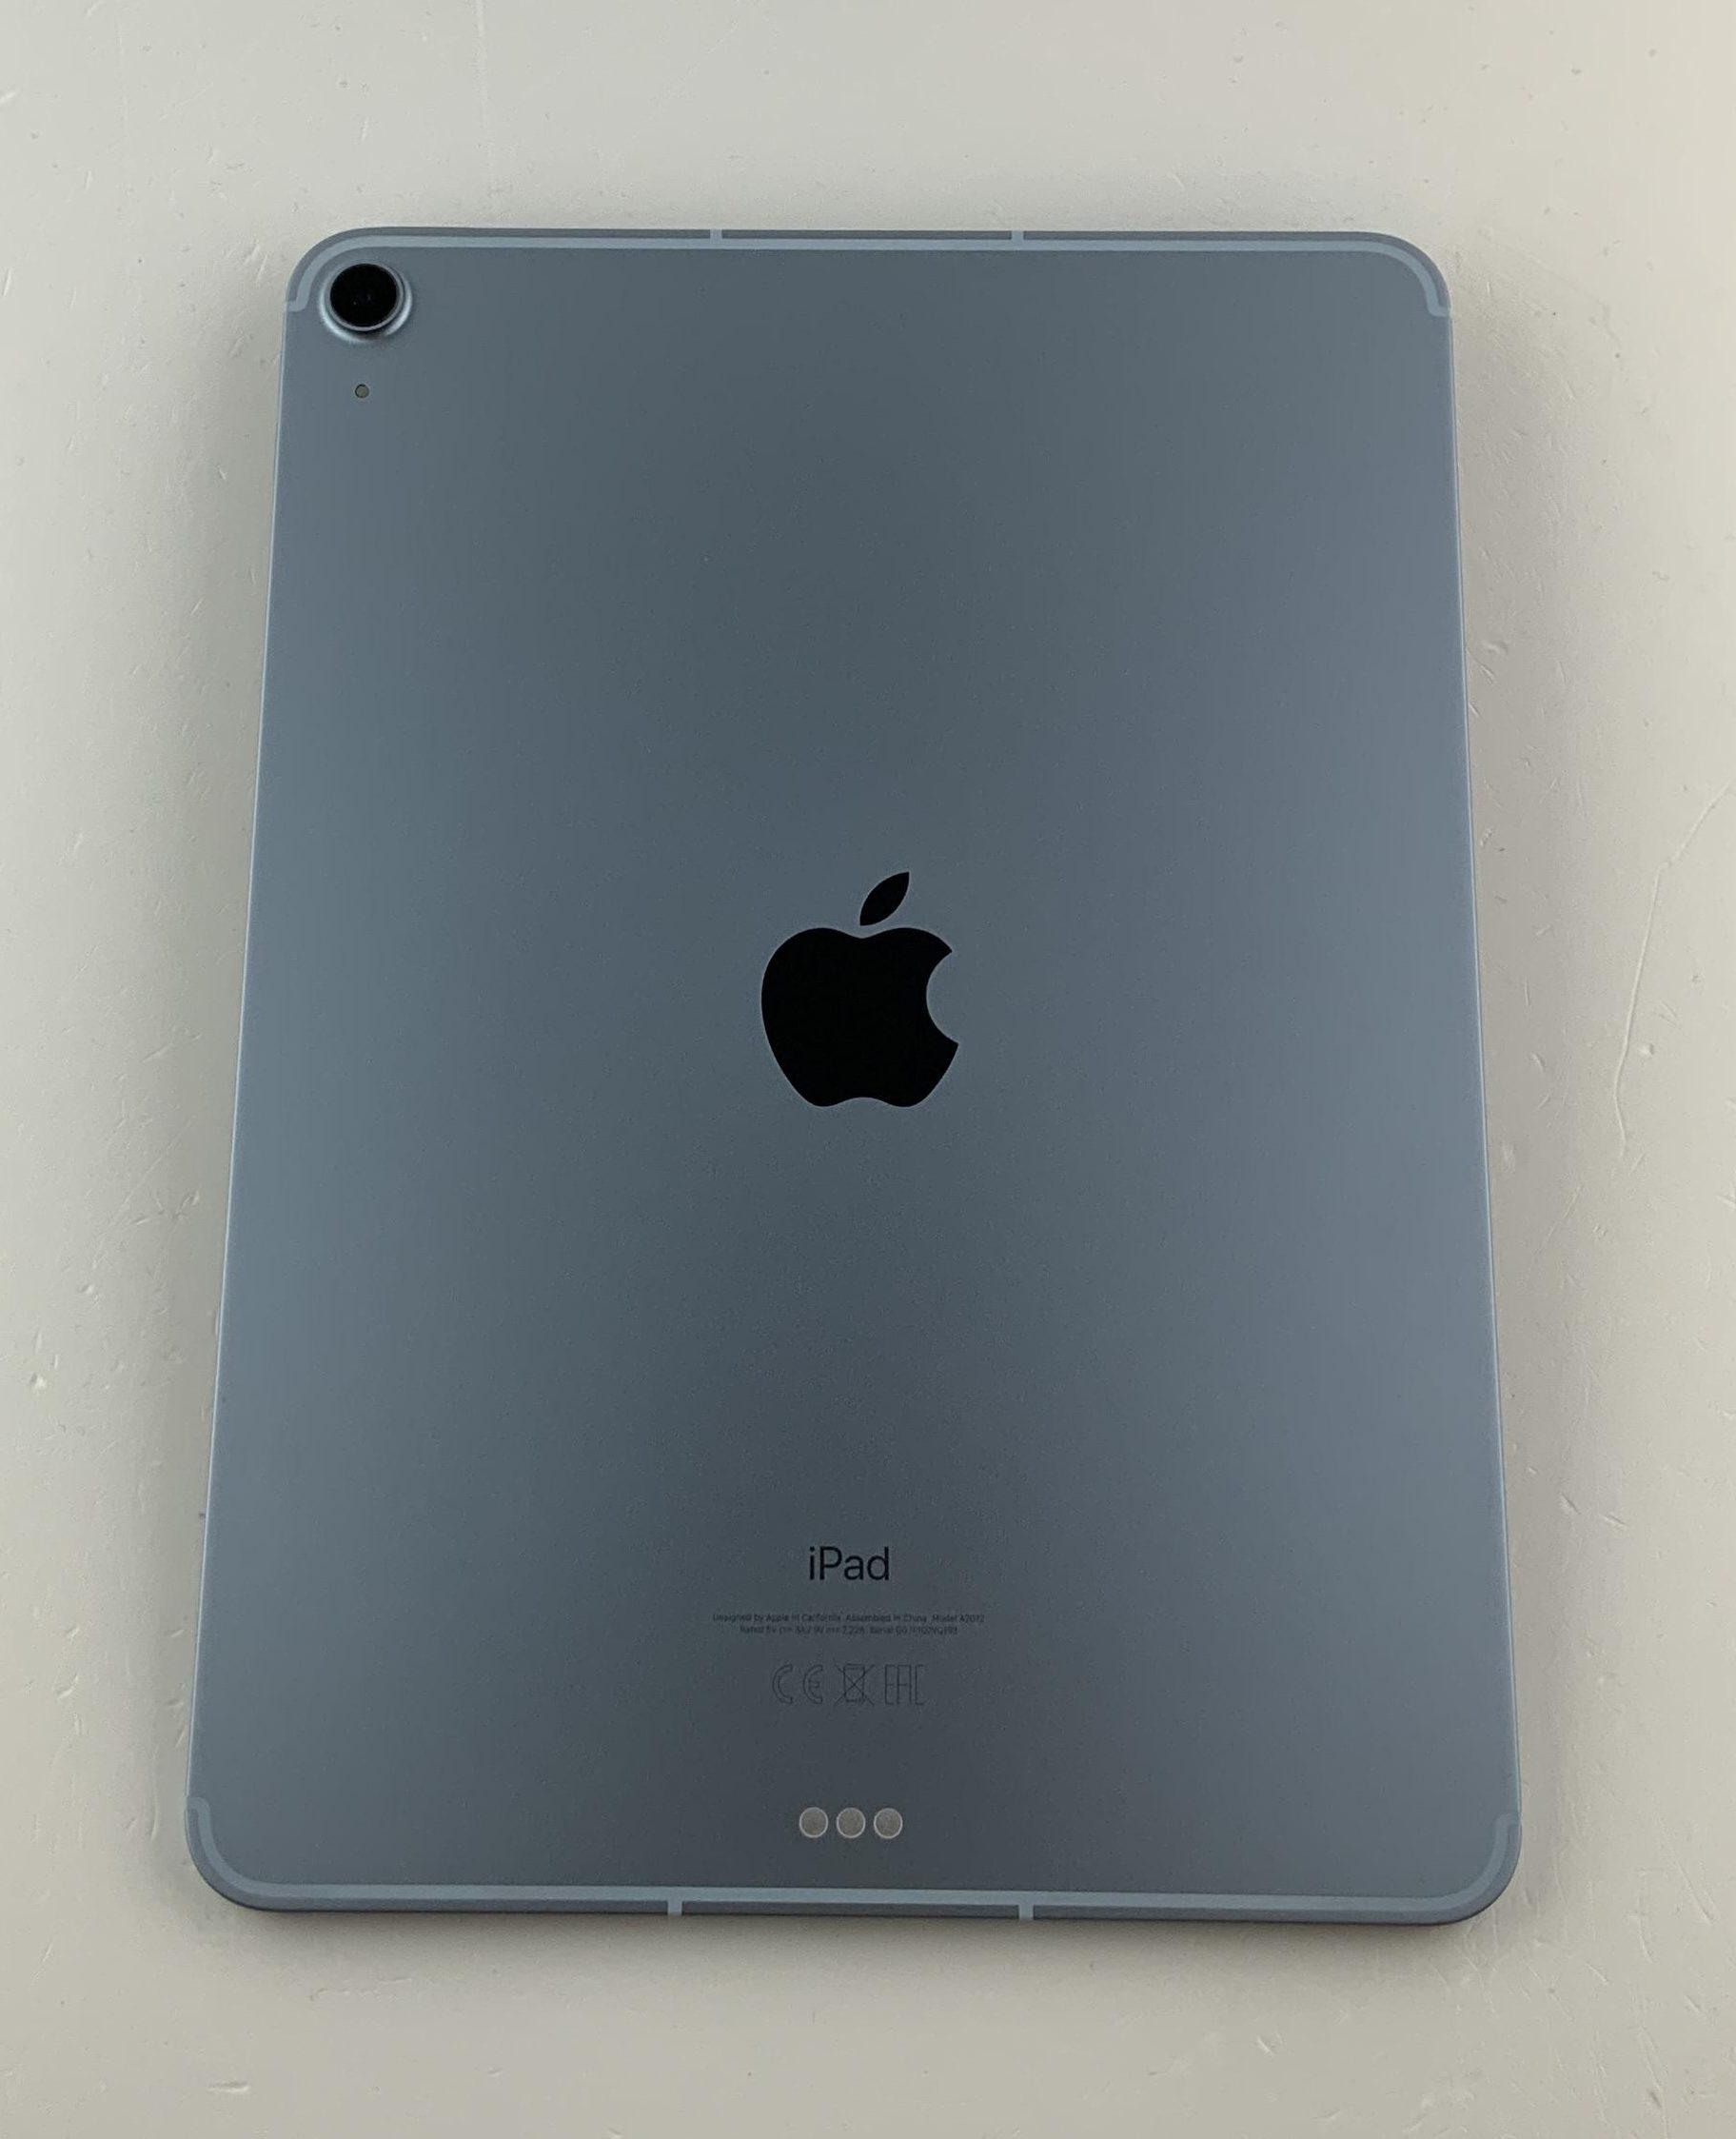 iPad Air 4 Wi-Fi + Cellular 64GB, 64GB, Sky Blue, Afbeelding 2